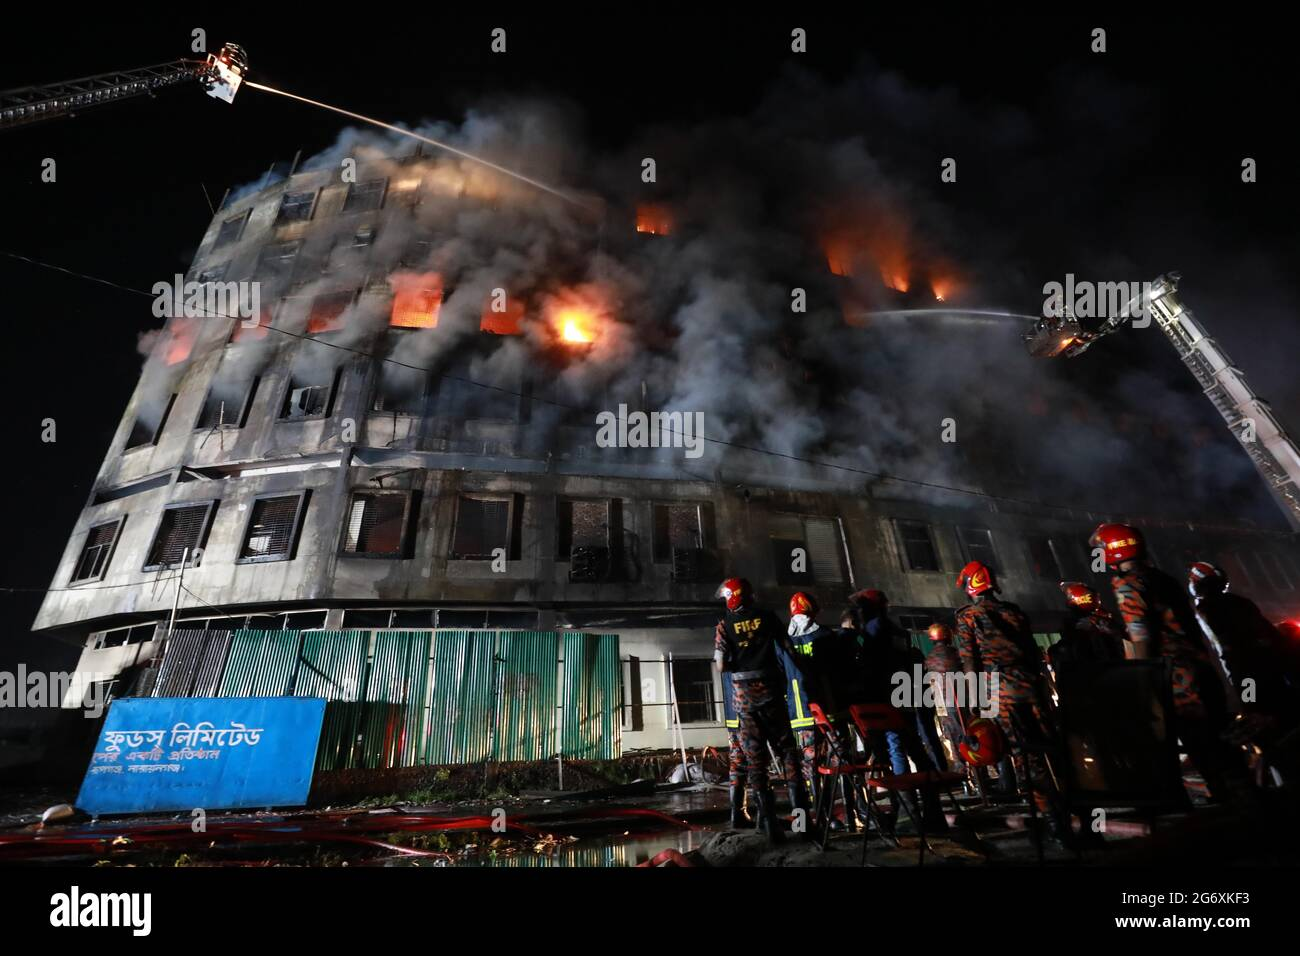 Dhaka, Dhaka, Bangladesh. 9 luglio 2021. 09, Luglio, 2021 incendio scoppiato presso la fabbrica di Hashem Foods Ltd in Narayanganj's Rupganj in Bangladesh Credit: Harun-or-Rashid/ZUMA Wire/Alamy Live News Foto Stock